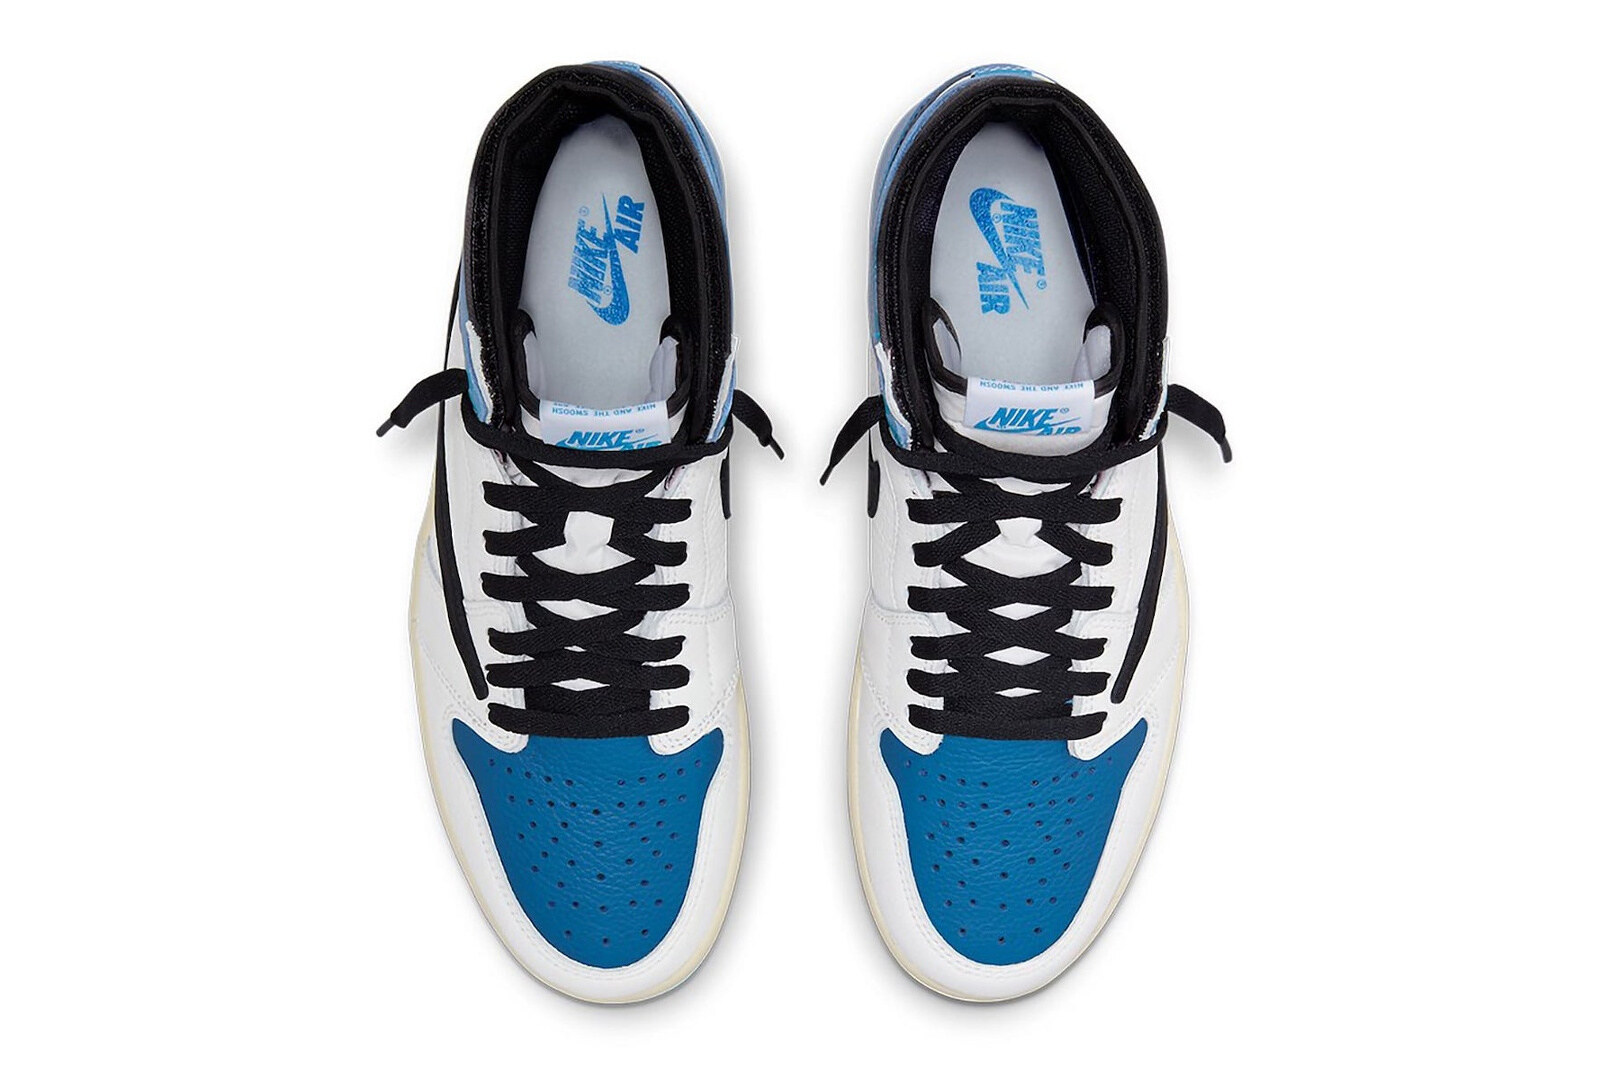 Nike x fragment x Travis Scott x Air Jordan 1 High